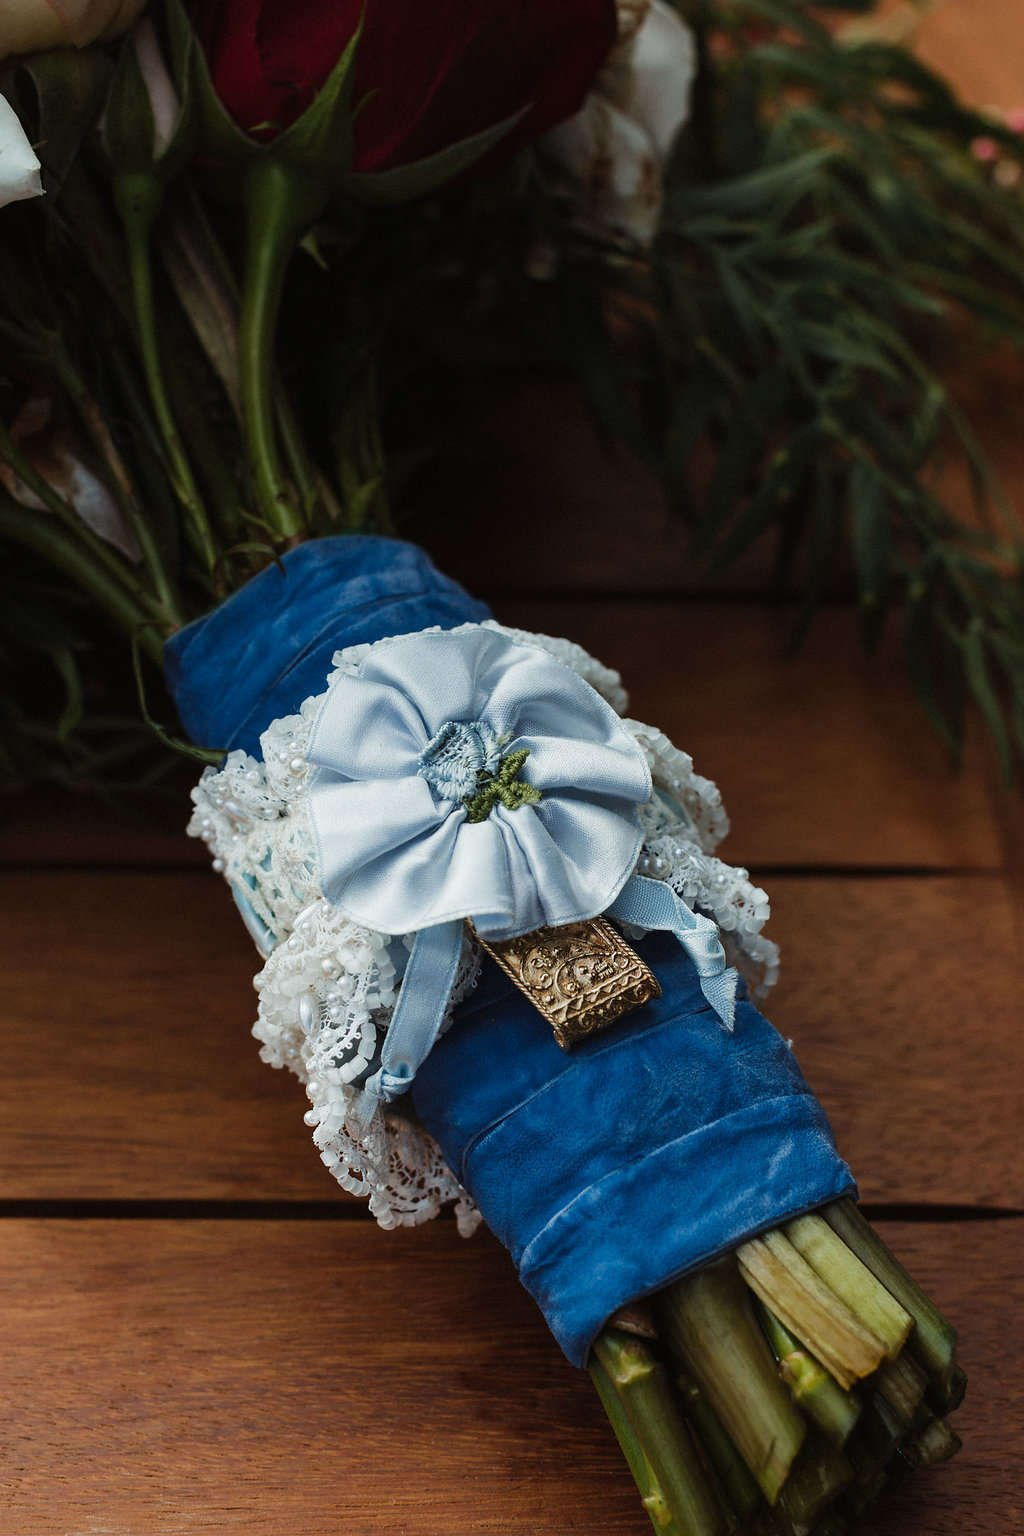 You can DIY your own wedding flowers! diy bride, flower moxie, diy flowers, budget bride, diy wedding